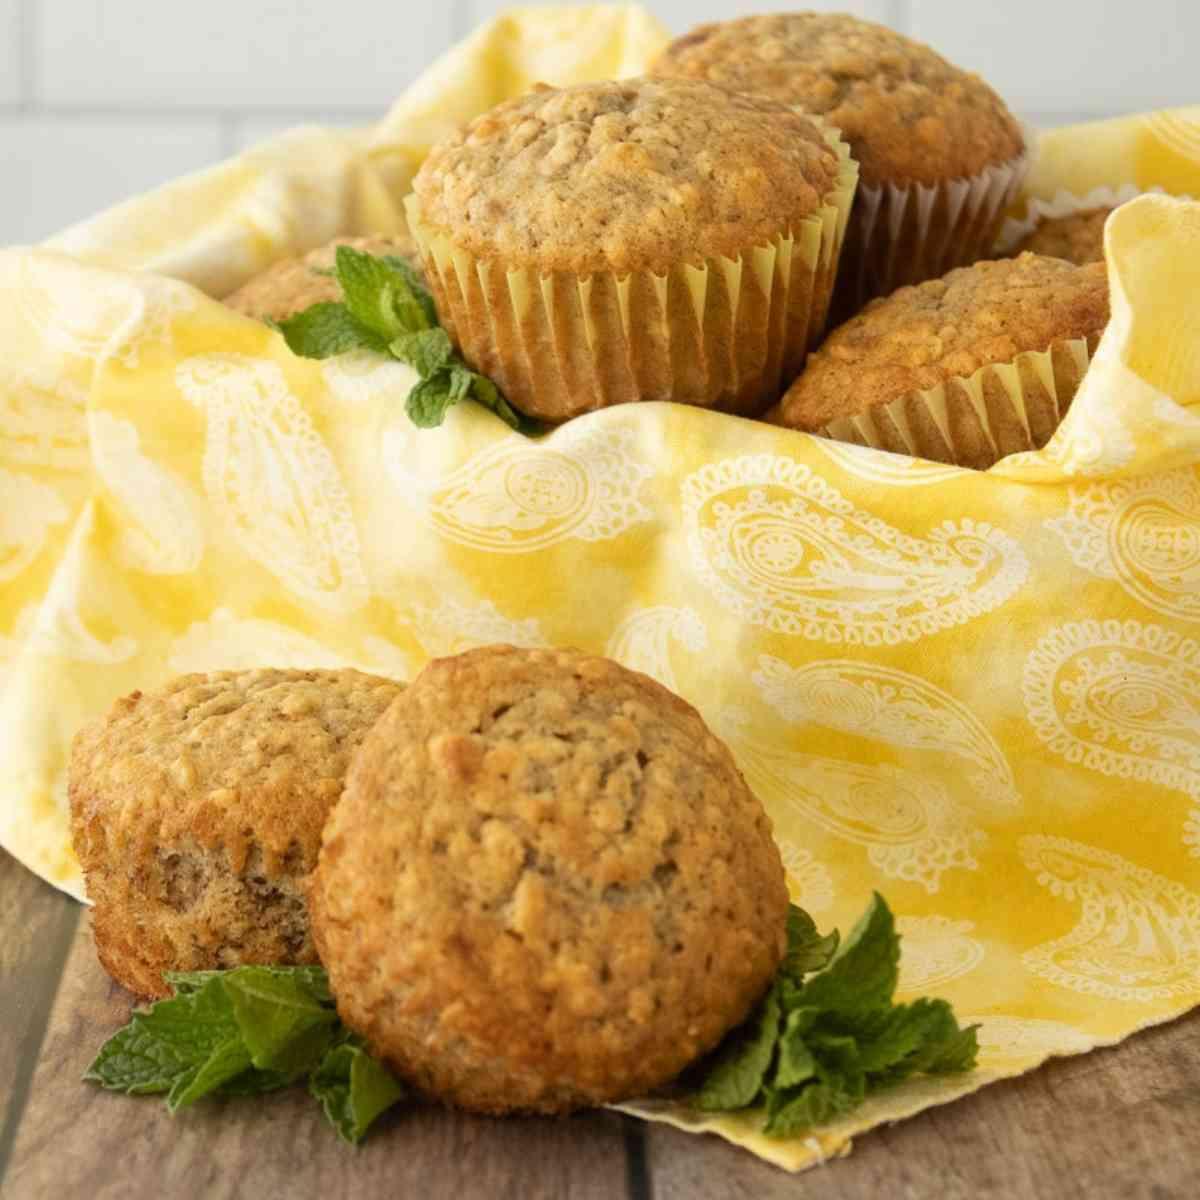 Basket of fresh banana oatmeal muffins